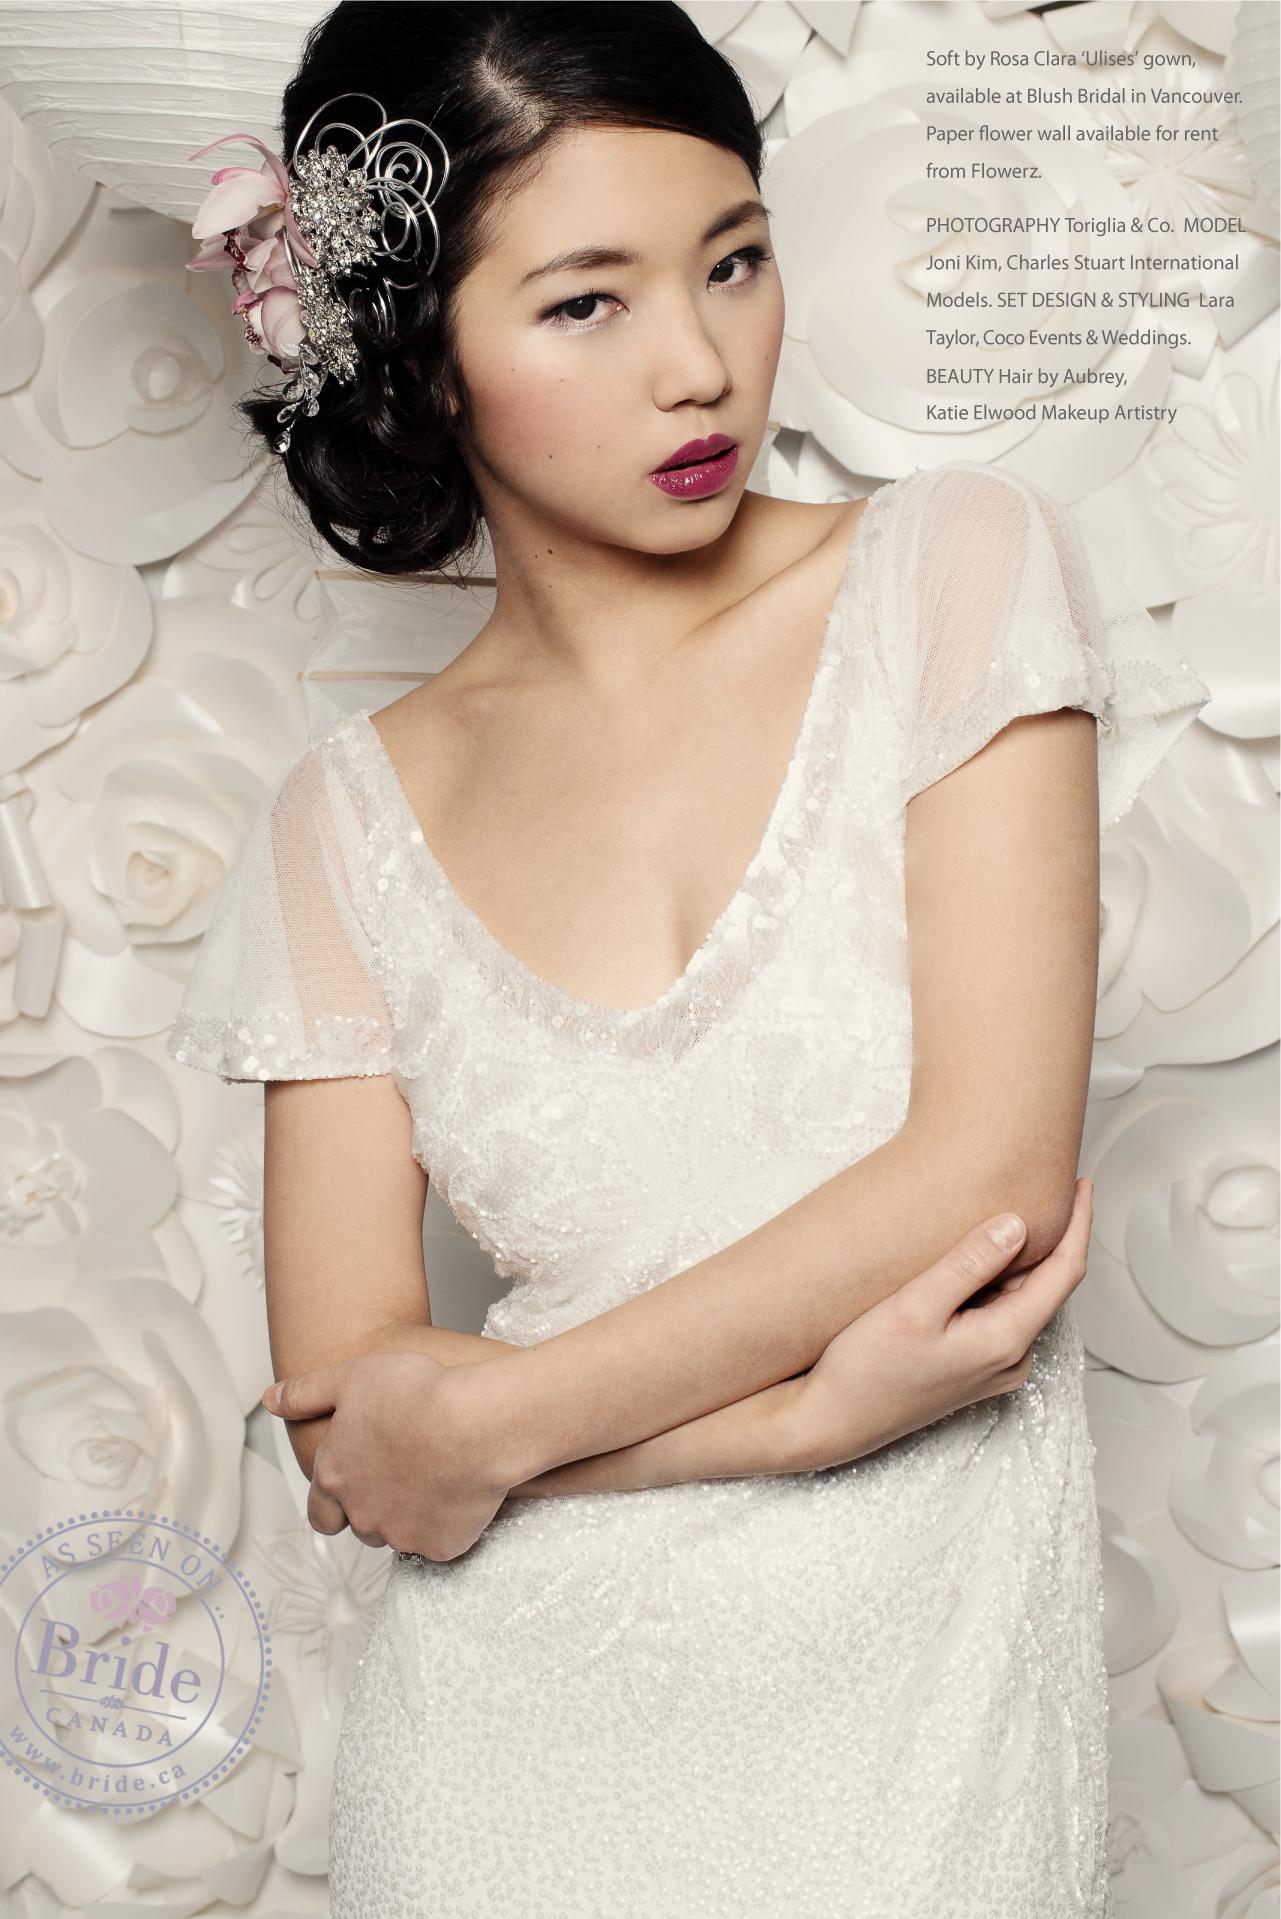 Wedding Dress Rental Toronto 71 Ideal asian model wearing rosa